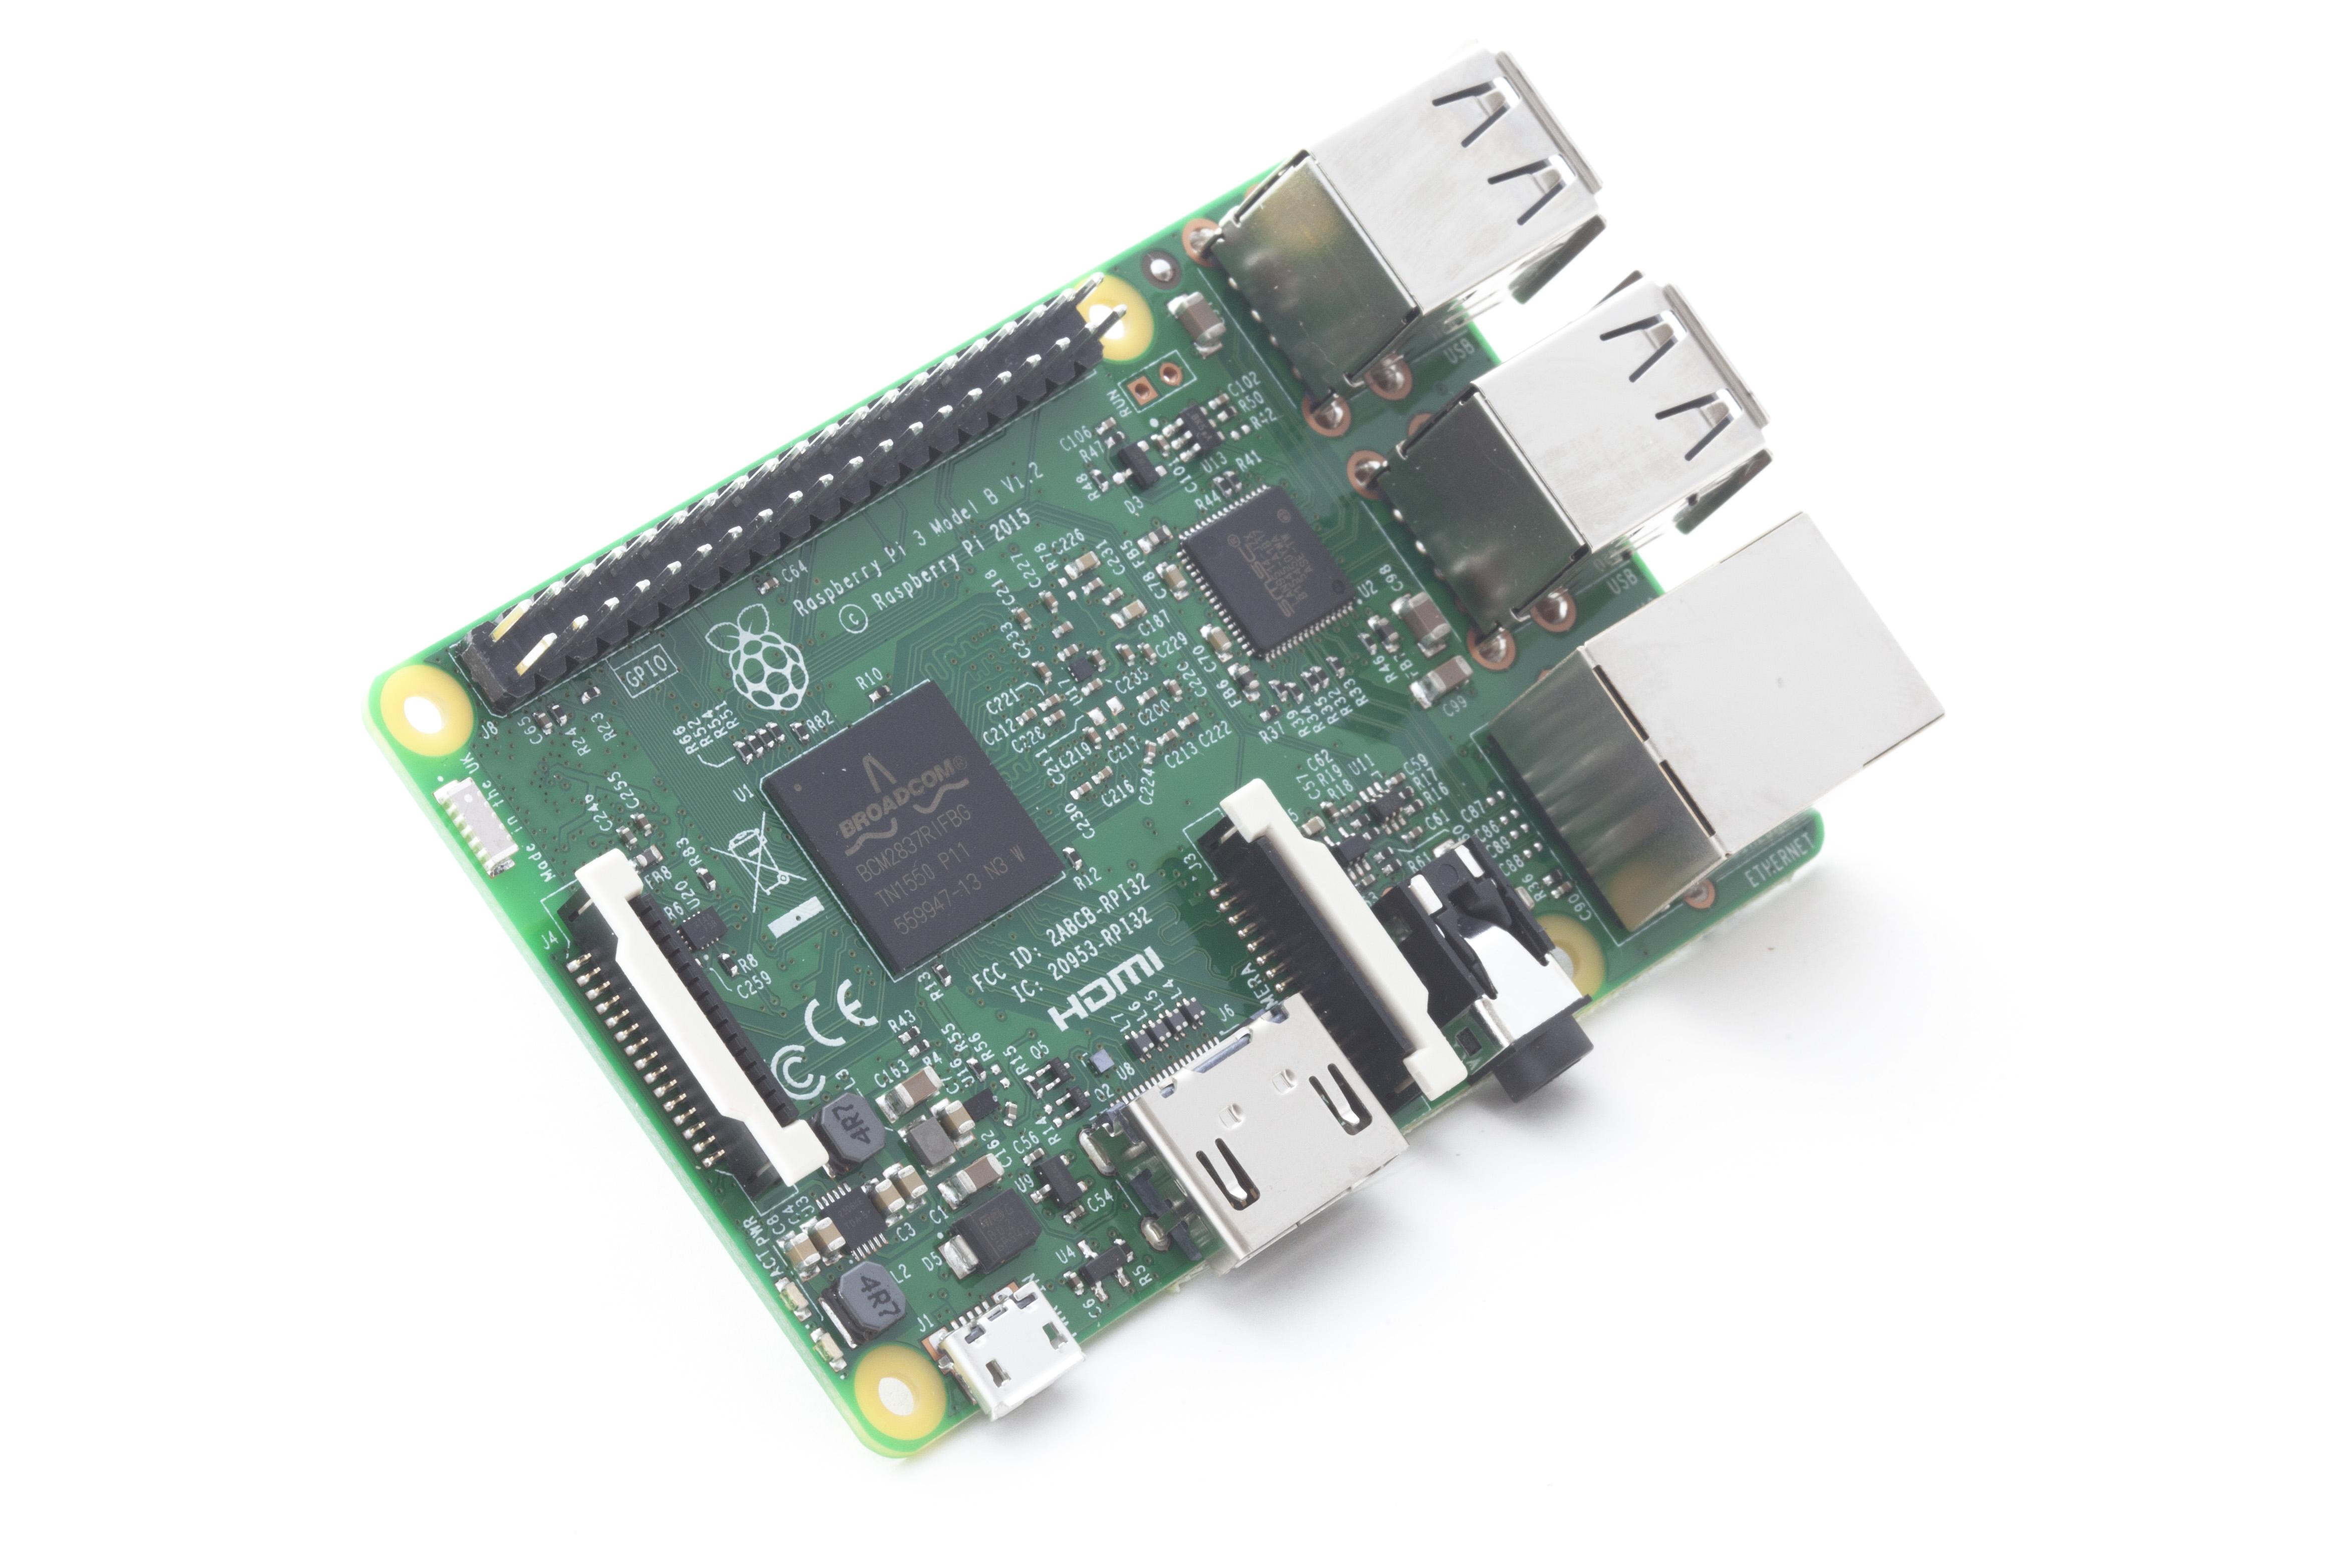 Der Raspberry Pi 3 Model B - Quelle: raspberrypi.org